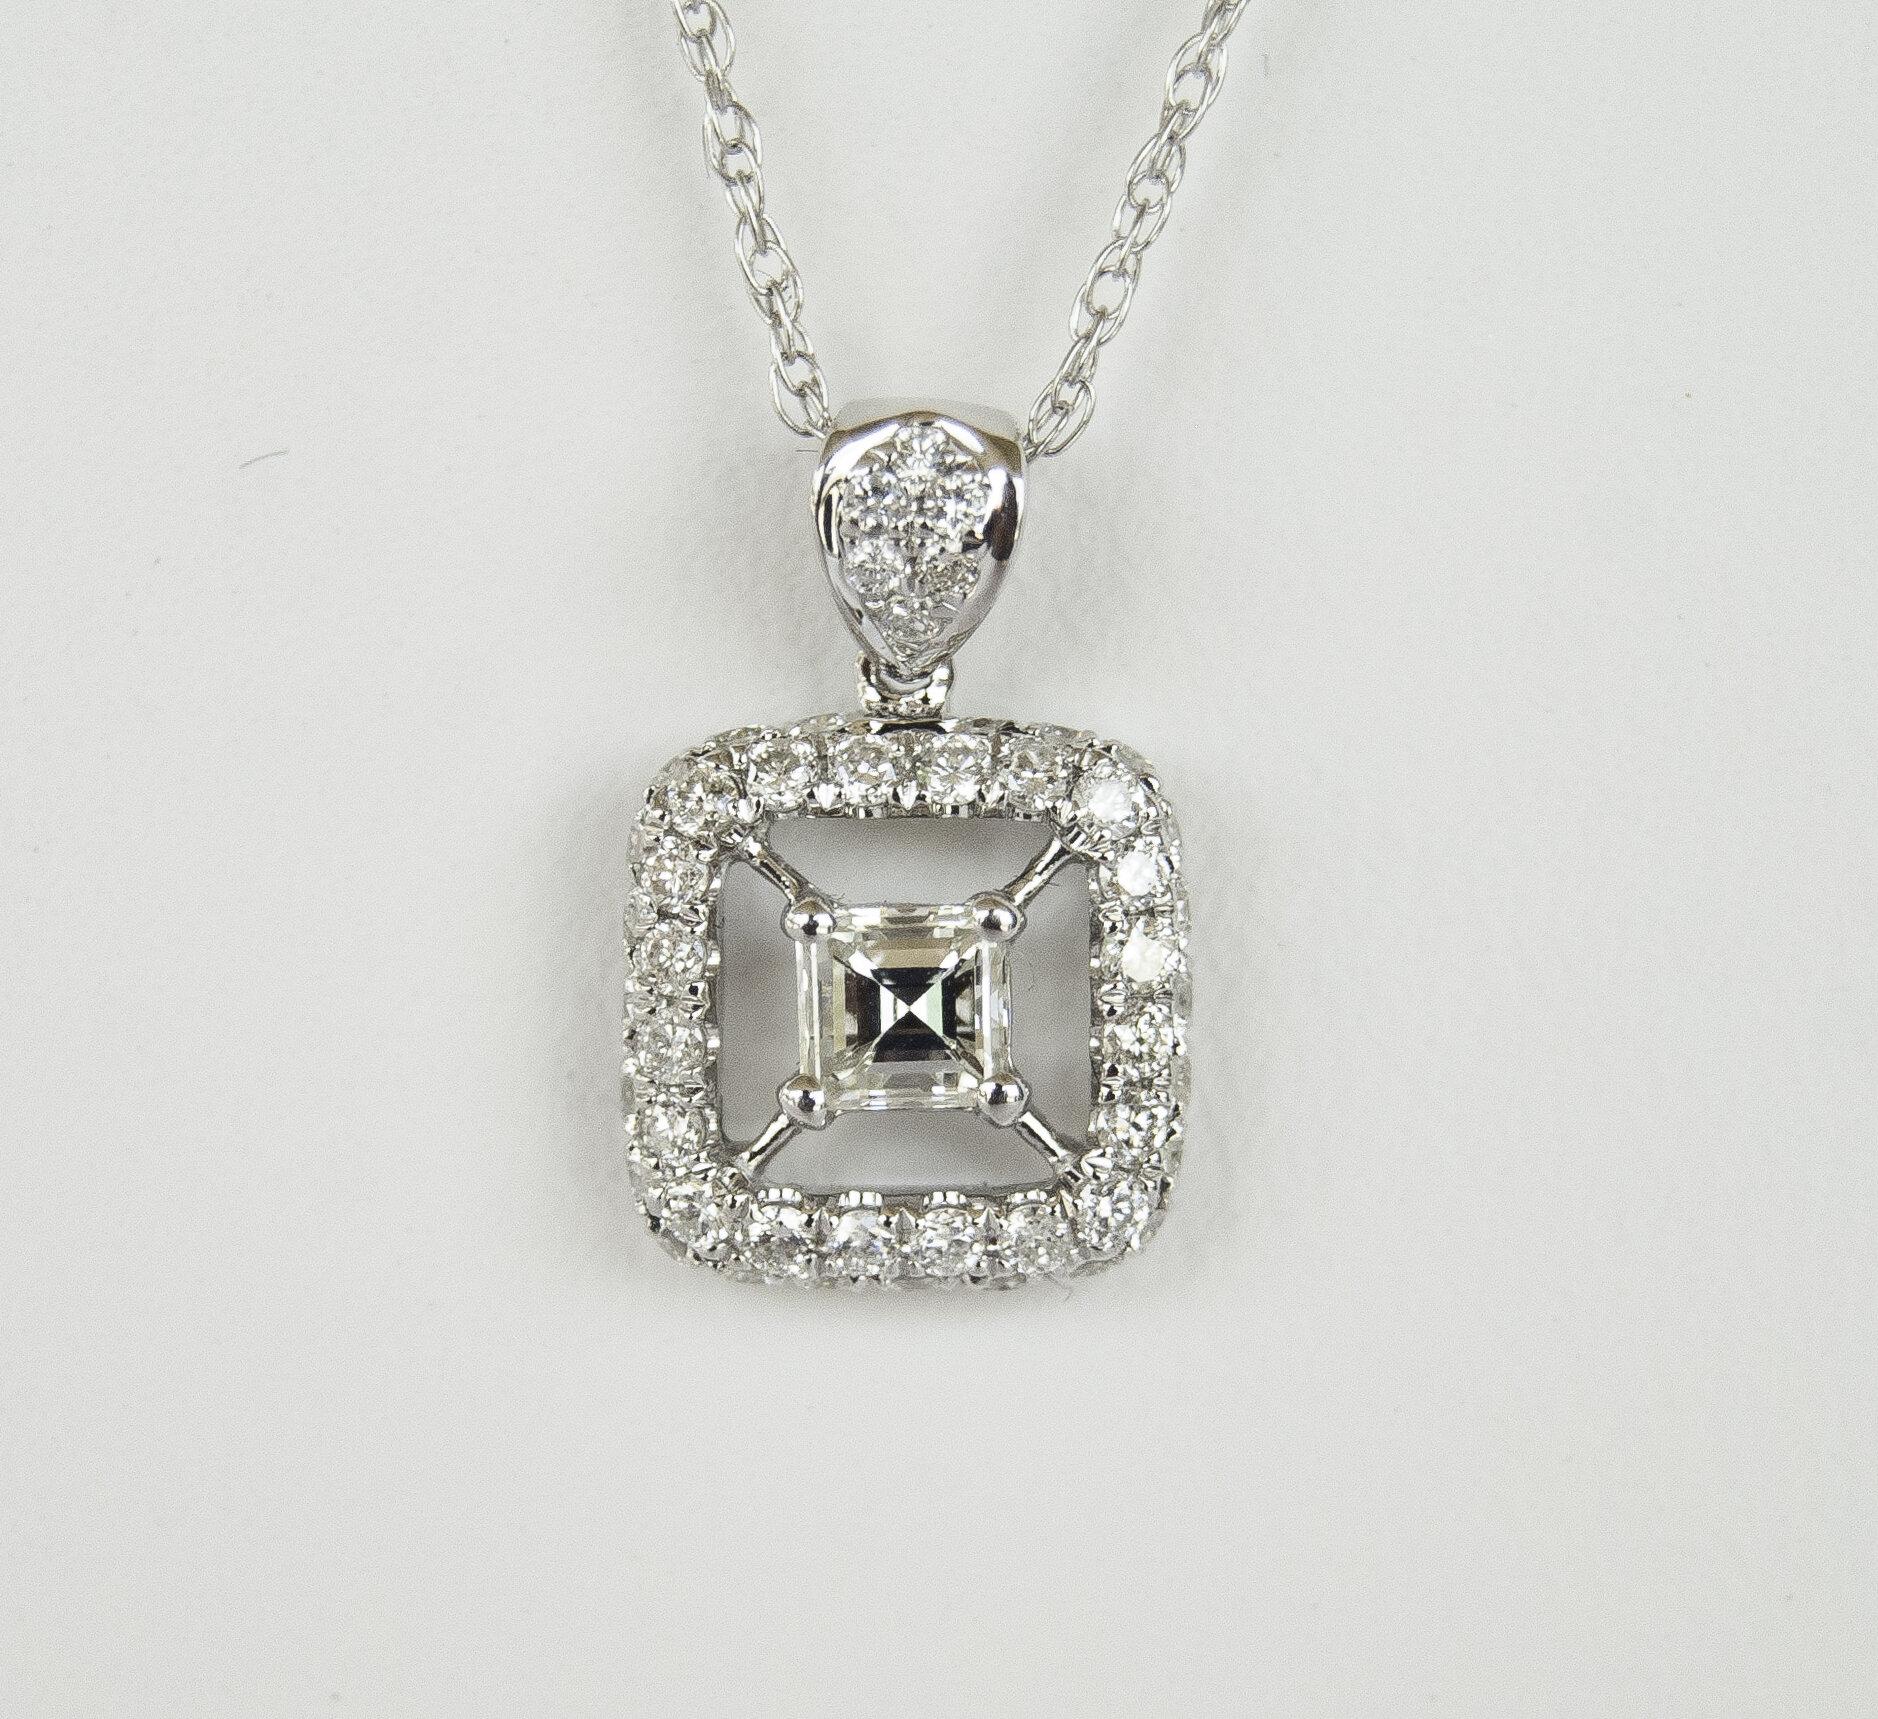 160-397   14 Karat White gold Halo Pendant With One 0.25Ct Emerald Cut Diamond And 0.40Tw Round Diamonds  14K WG Rope Chain  $1,680.00